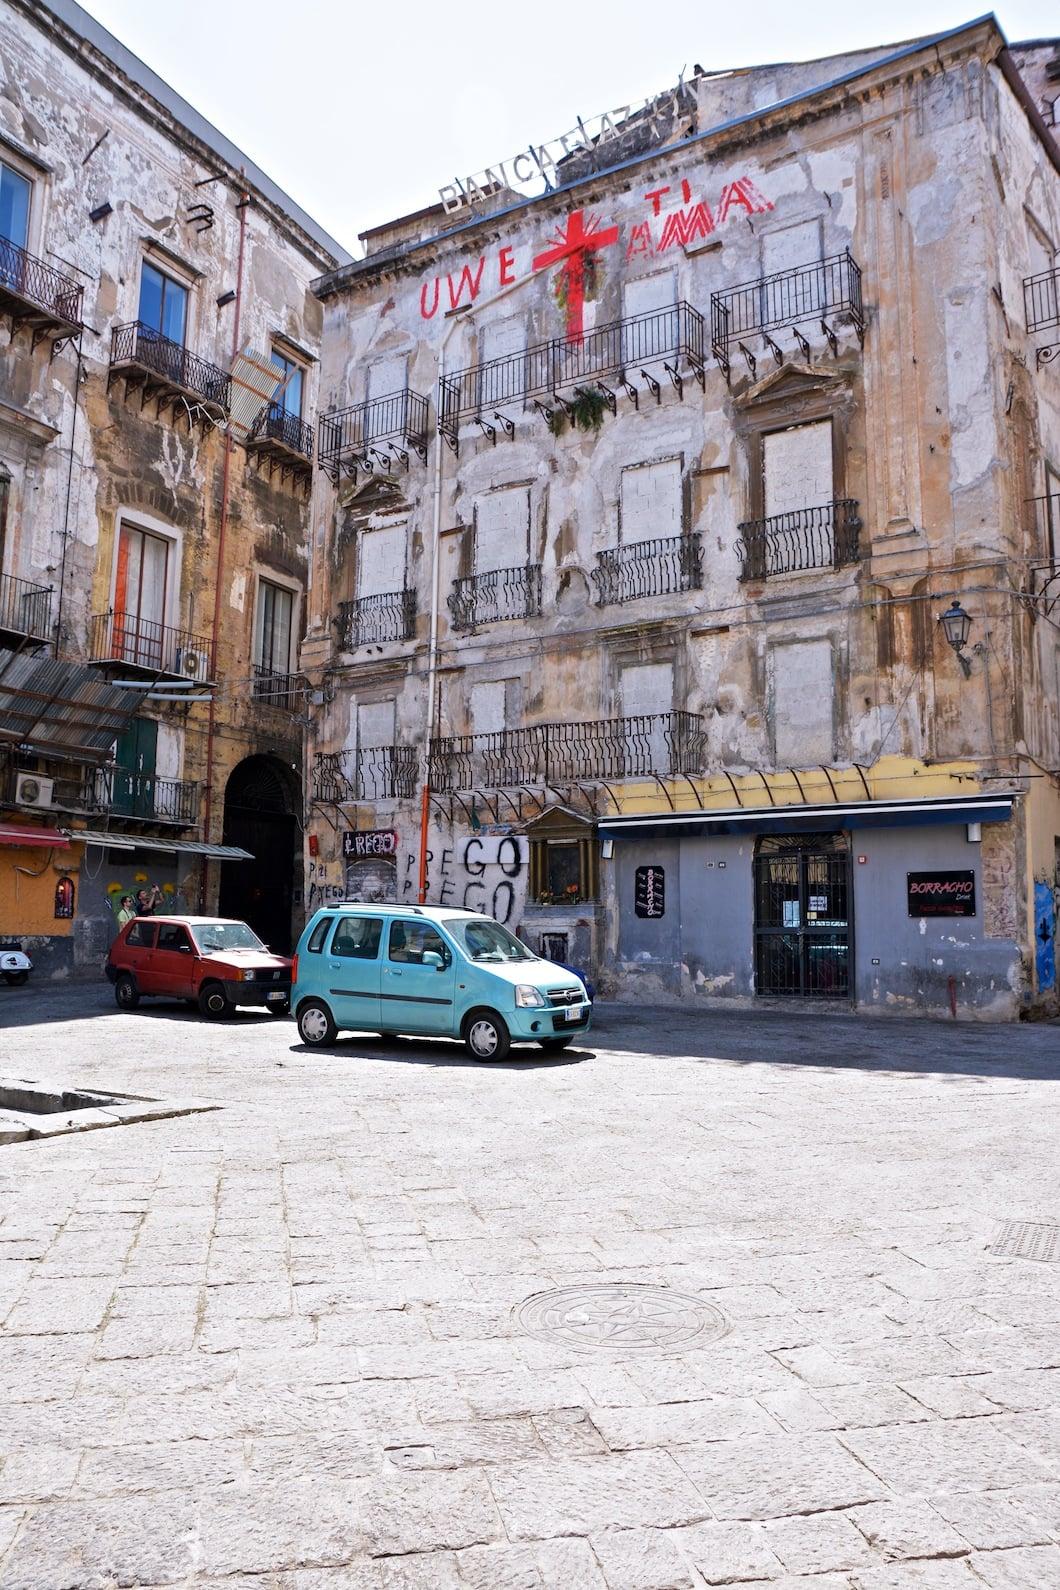 Palerme en Sicile - 22 v'la Scarlett